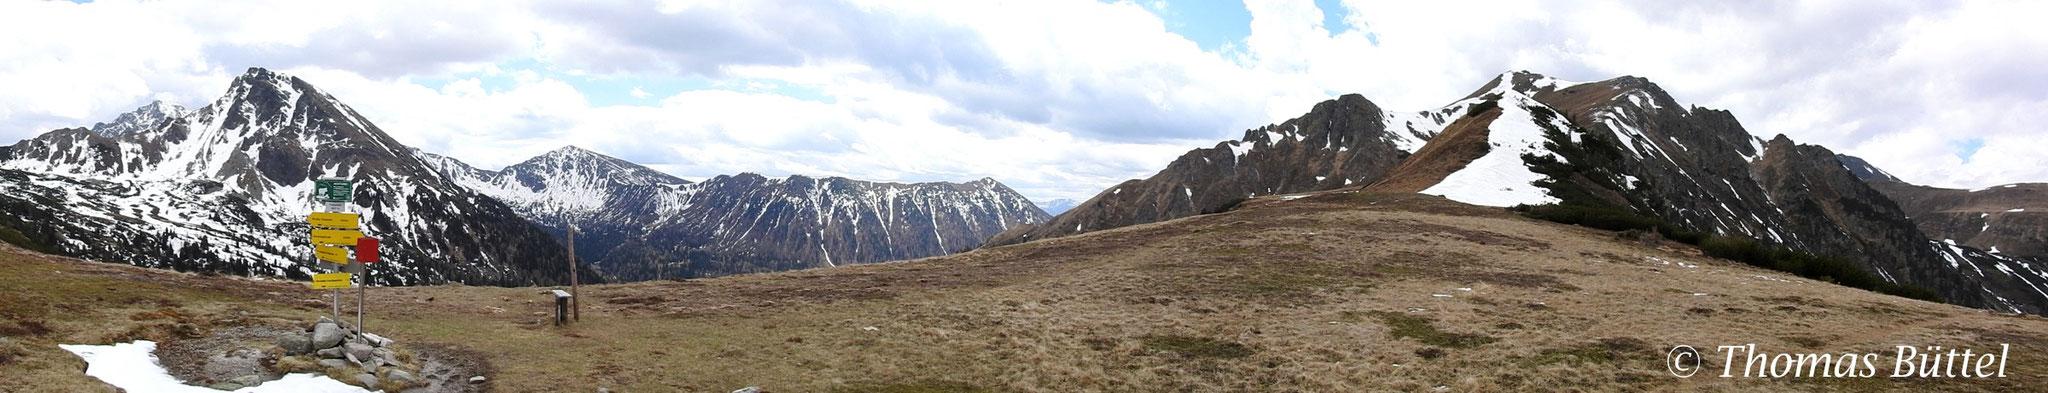 Triebener Törl panorama